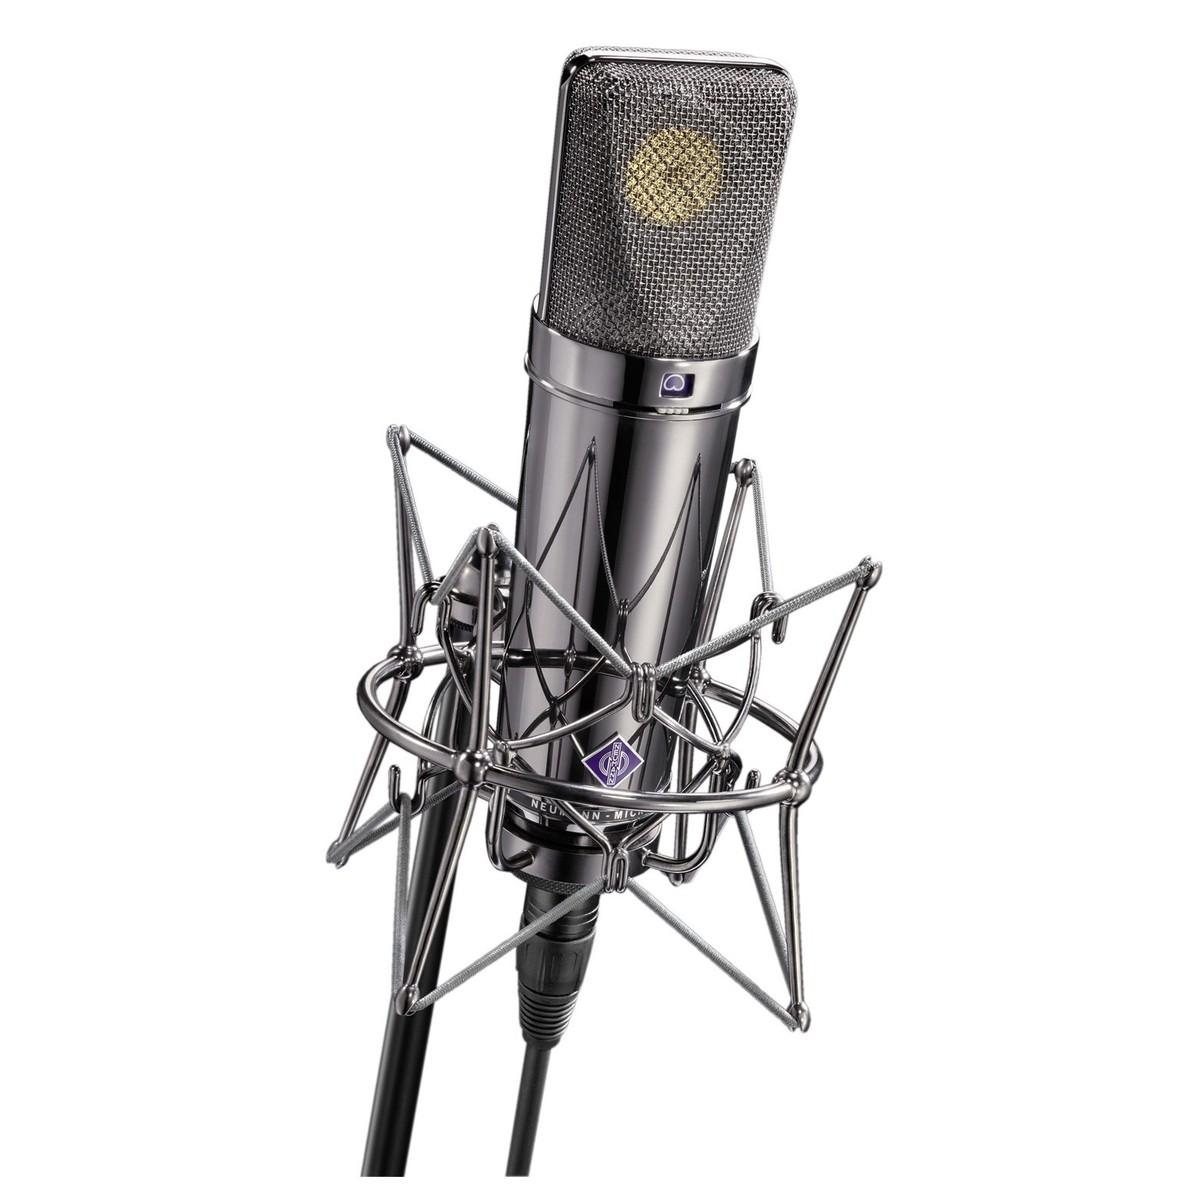 Neumann U 87 Rhodium Edition Studio Microphone At Gear4music Details About New U87 Type Circuit Condenser Case Shock Loading Zoom